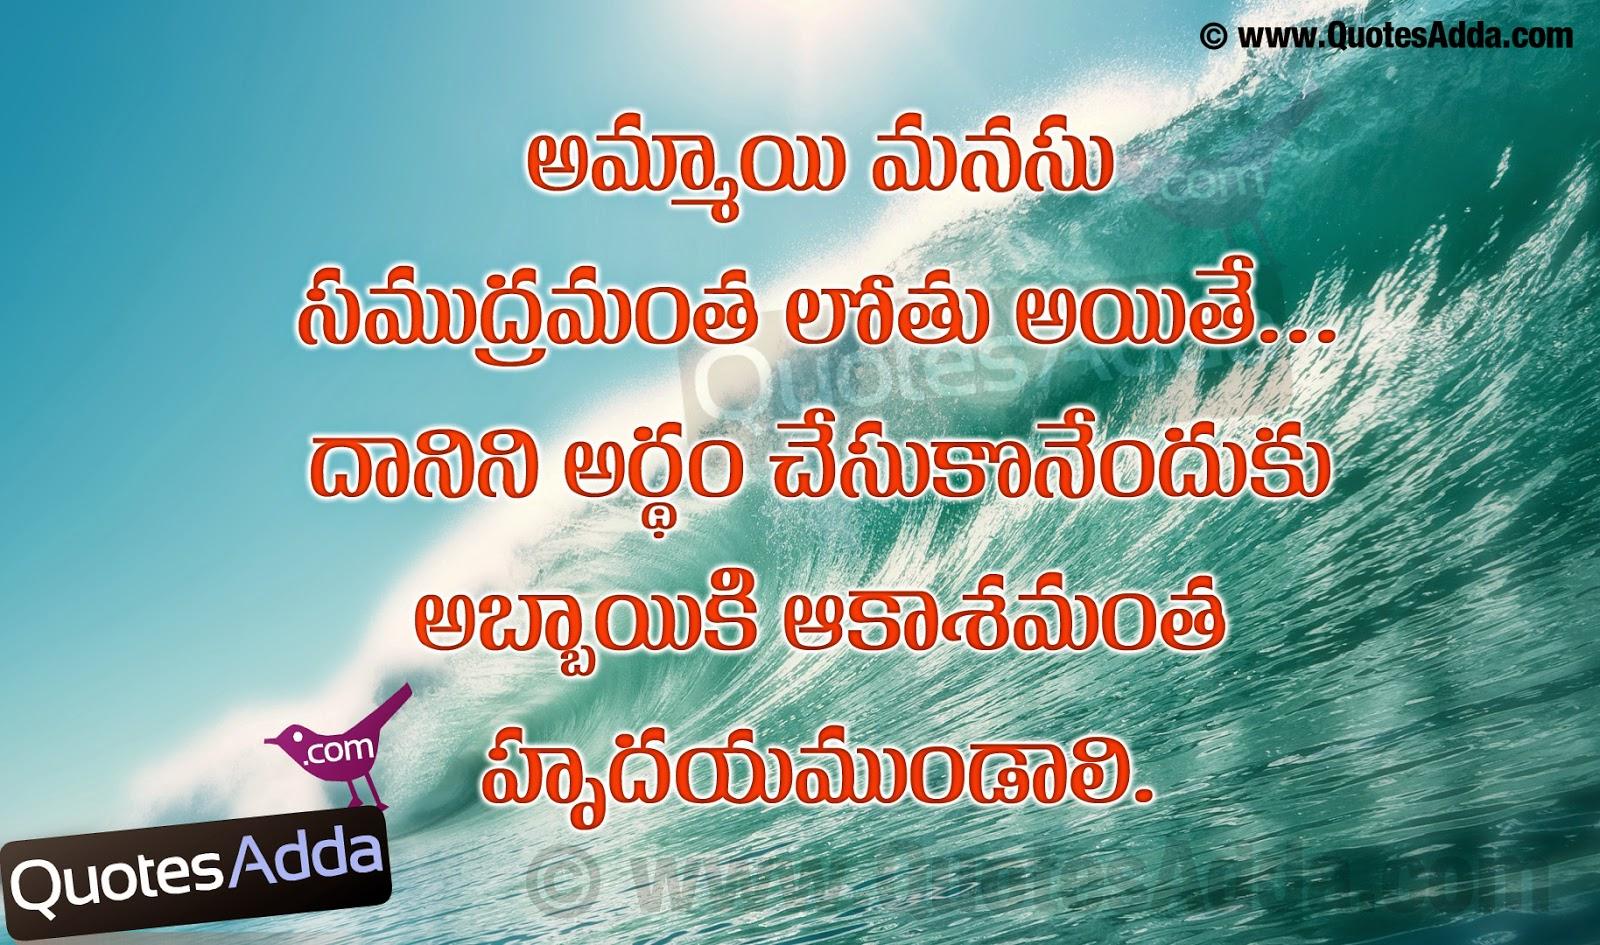 Telugu Love Quotes for Boys and Girls | QuotesAdda.com | Telugu ...